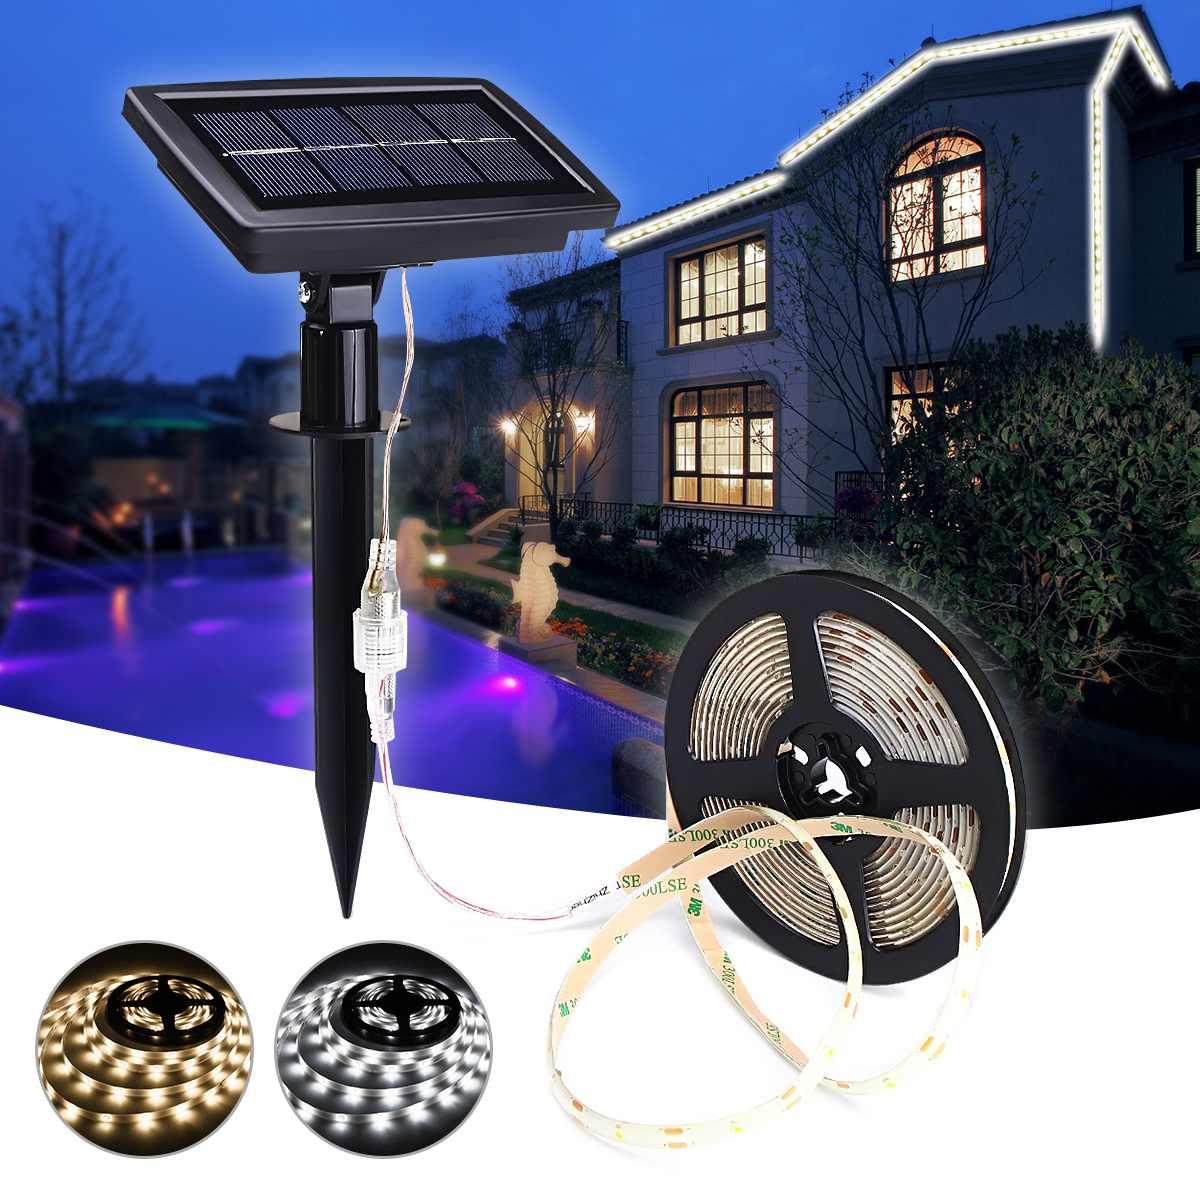 5m Waterproof Solar LED Strip Light 2835smd IP65 Pure White/warm White Single Color LED StripOutdoor Garden Decor